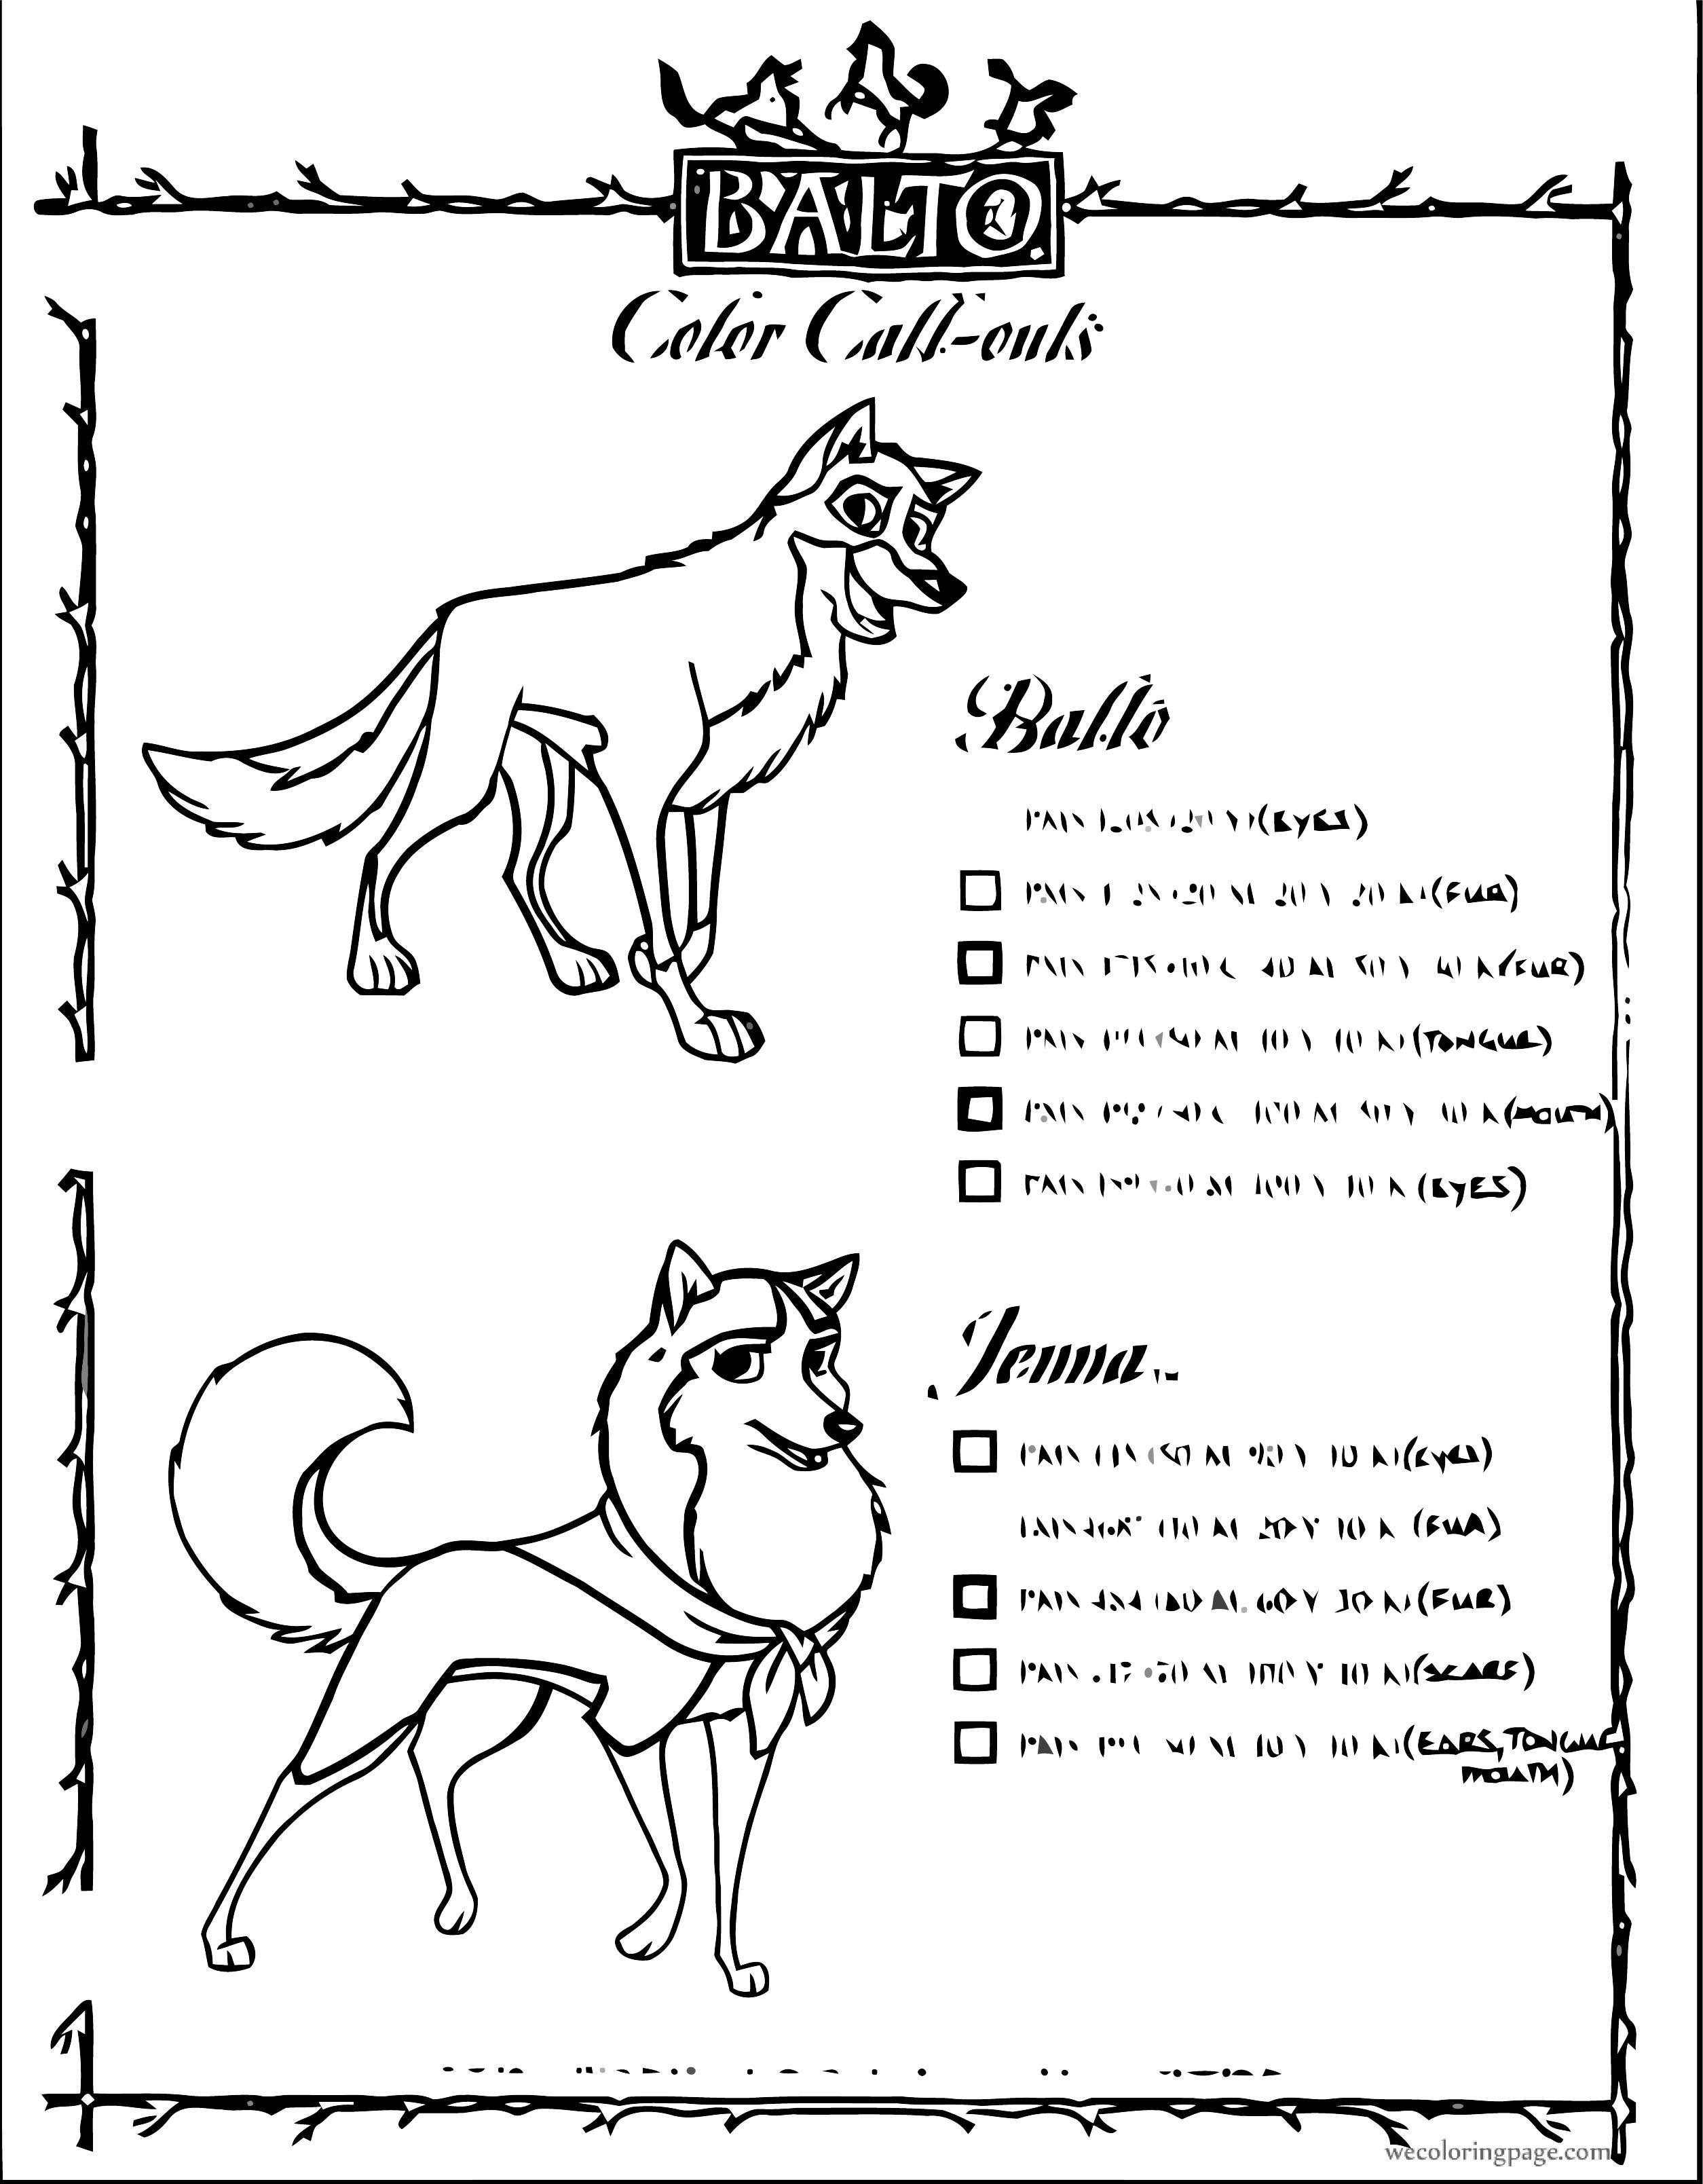 P Colour Key Balto Wolf Coloring Page